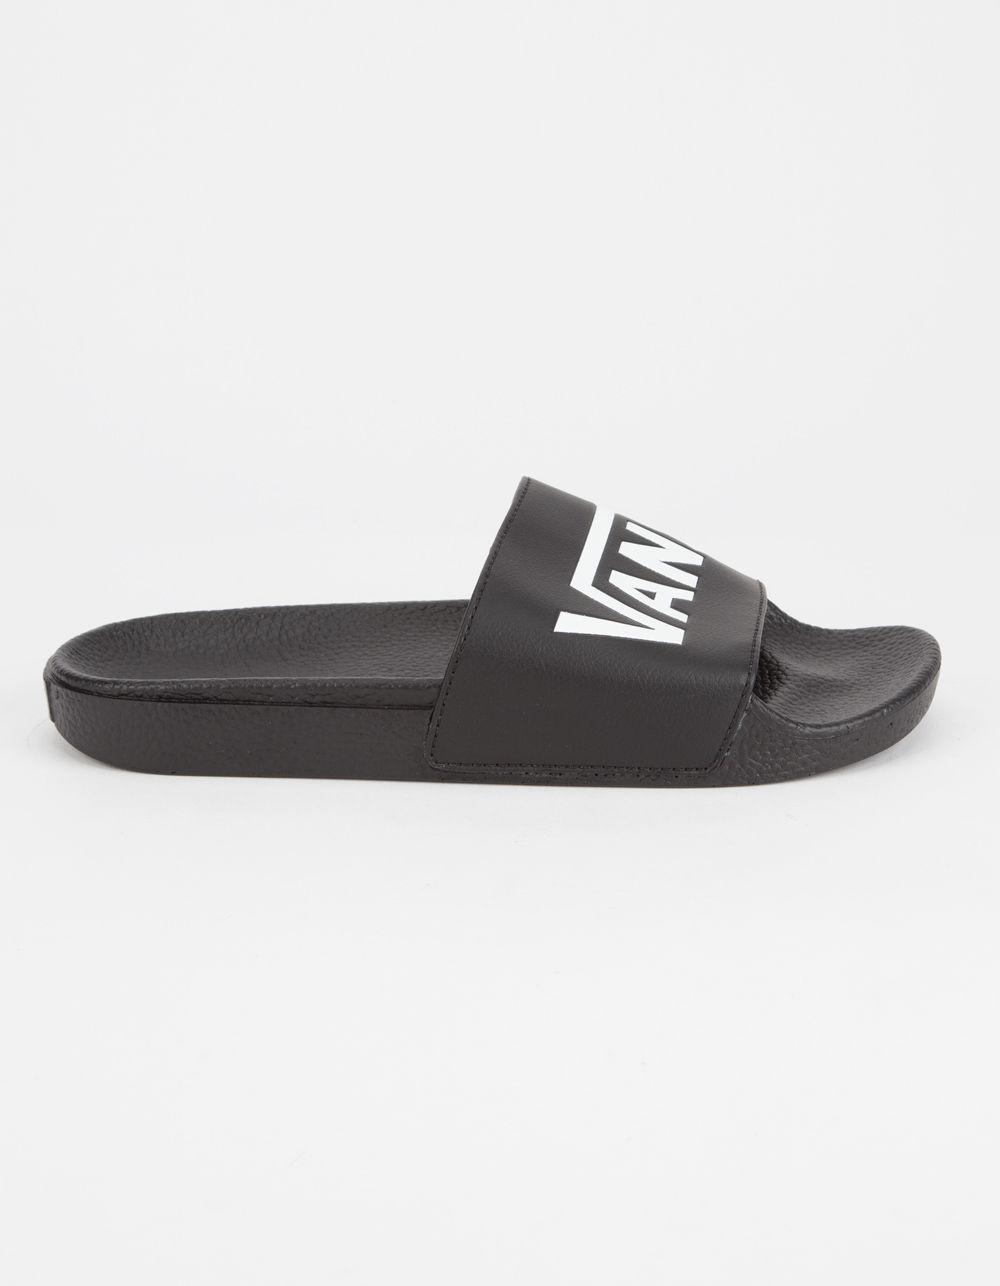 9a3370629a57e9 Lyst - Vans Slide-on in Black